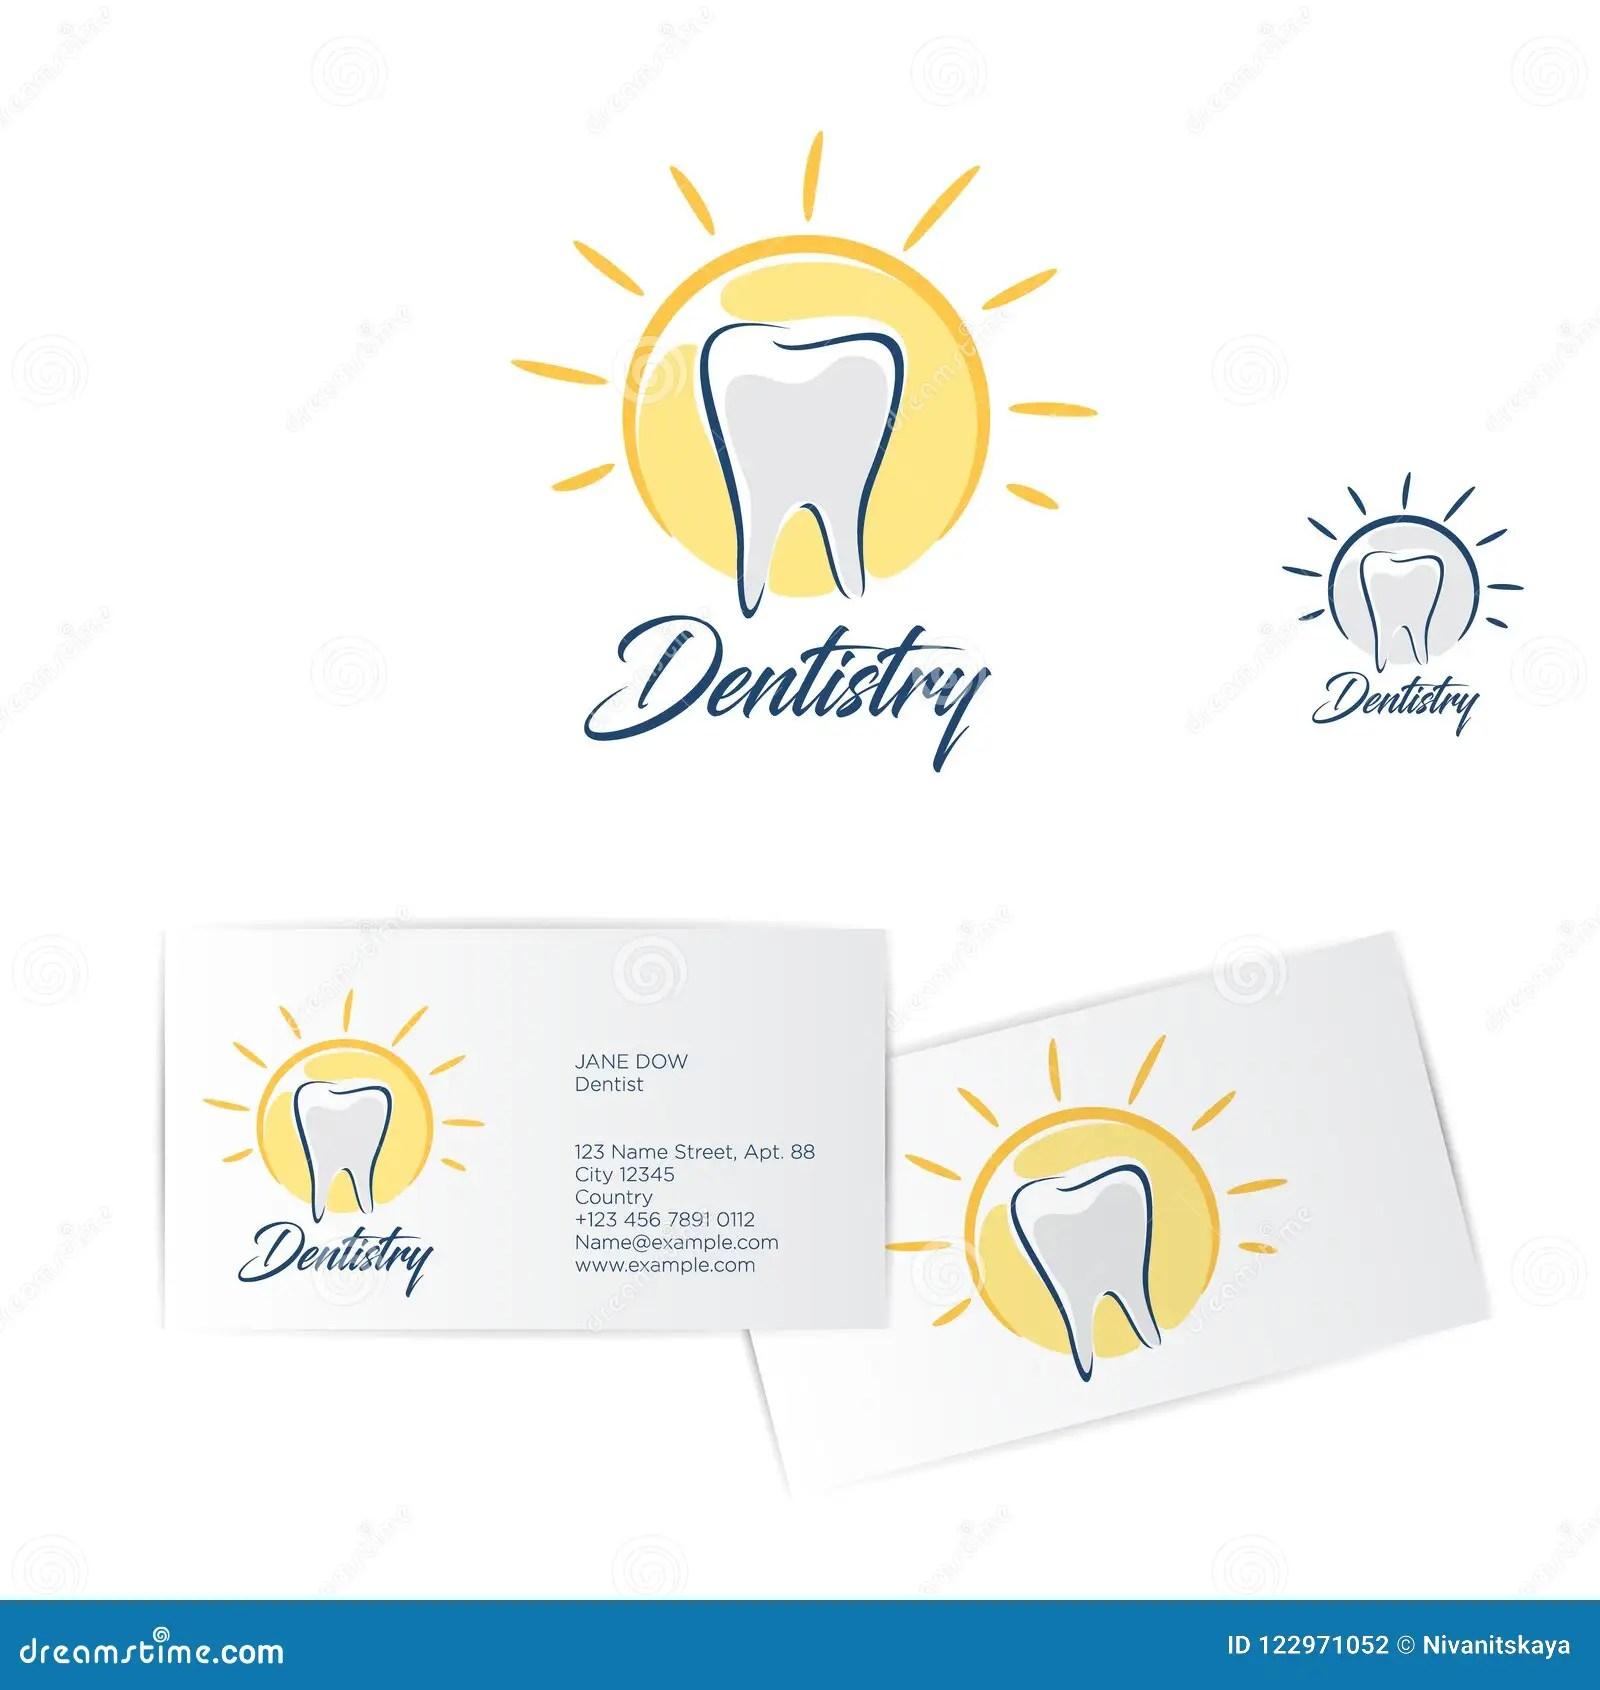 dentistry logo dentist business